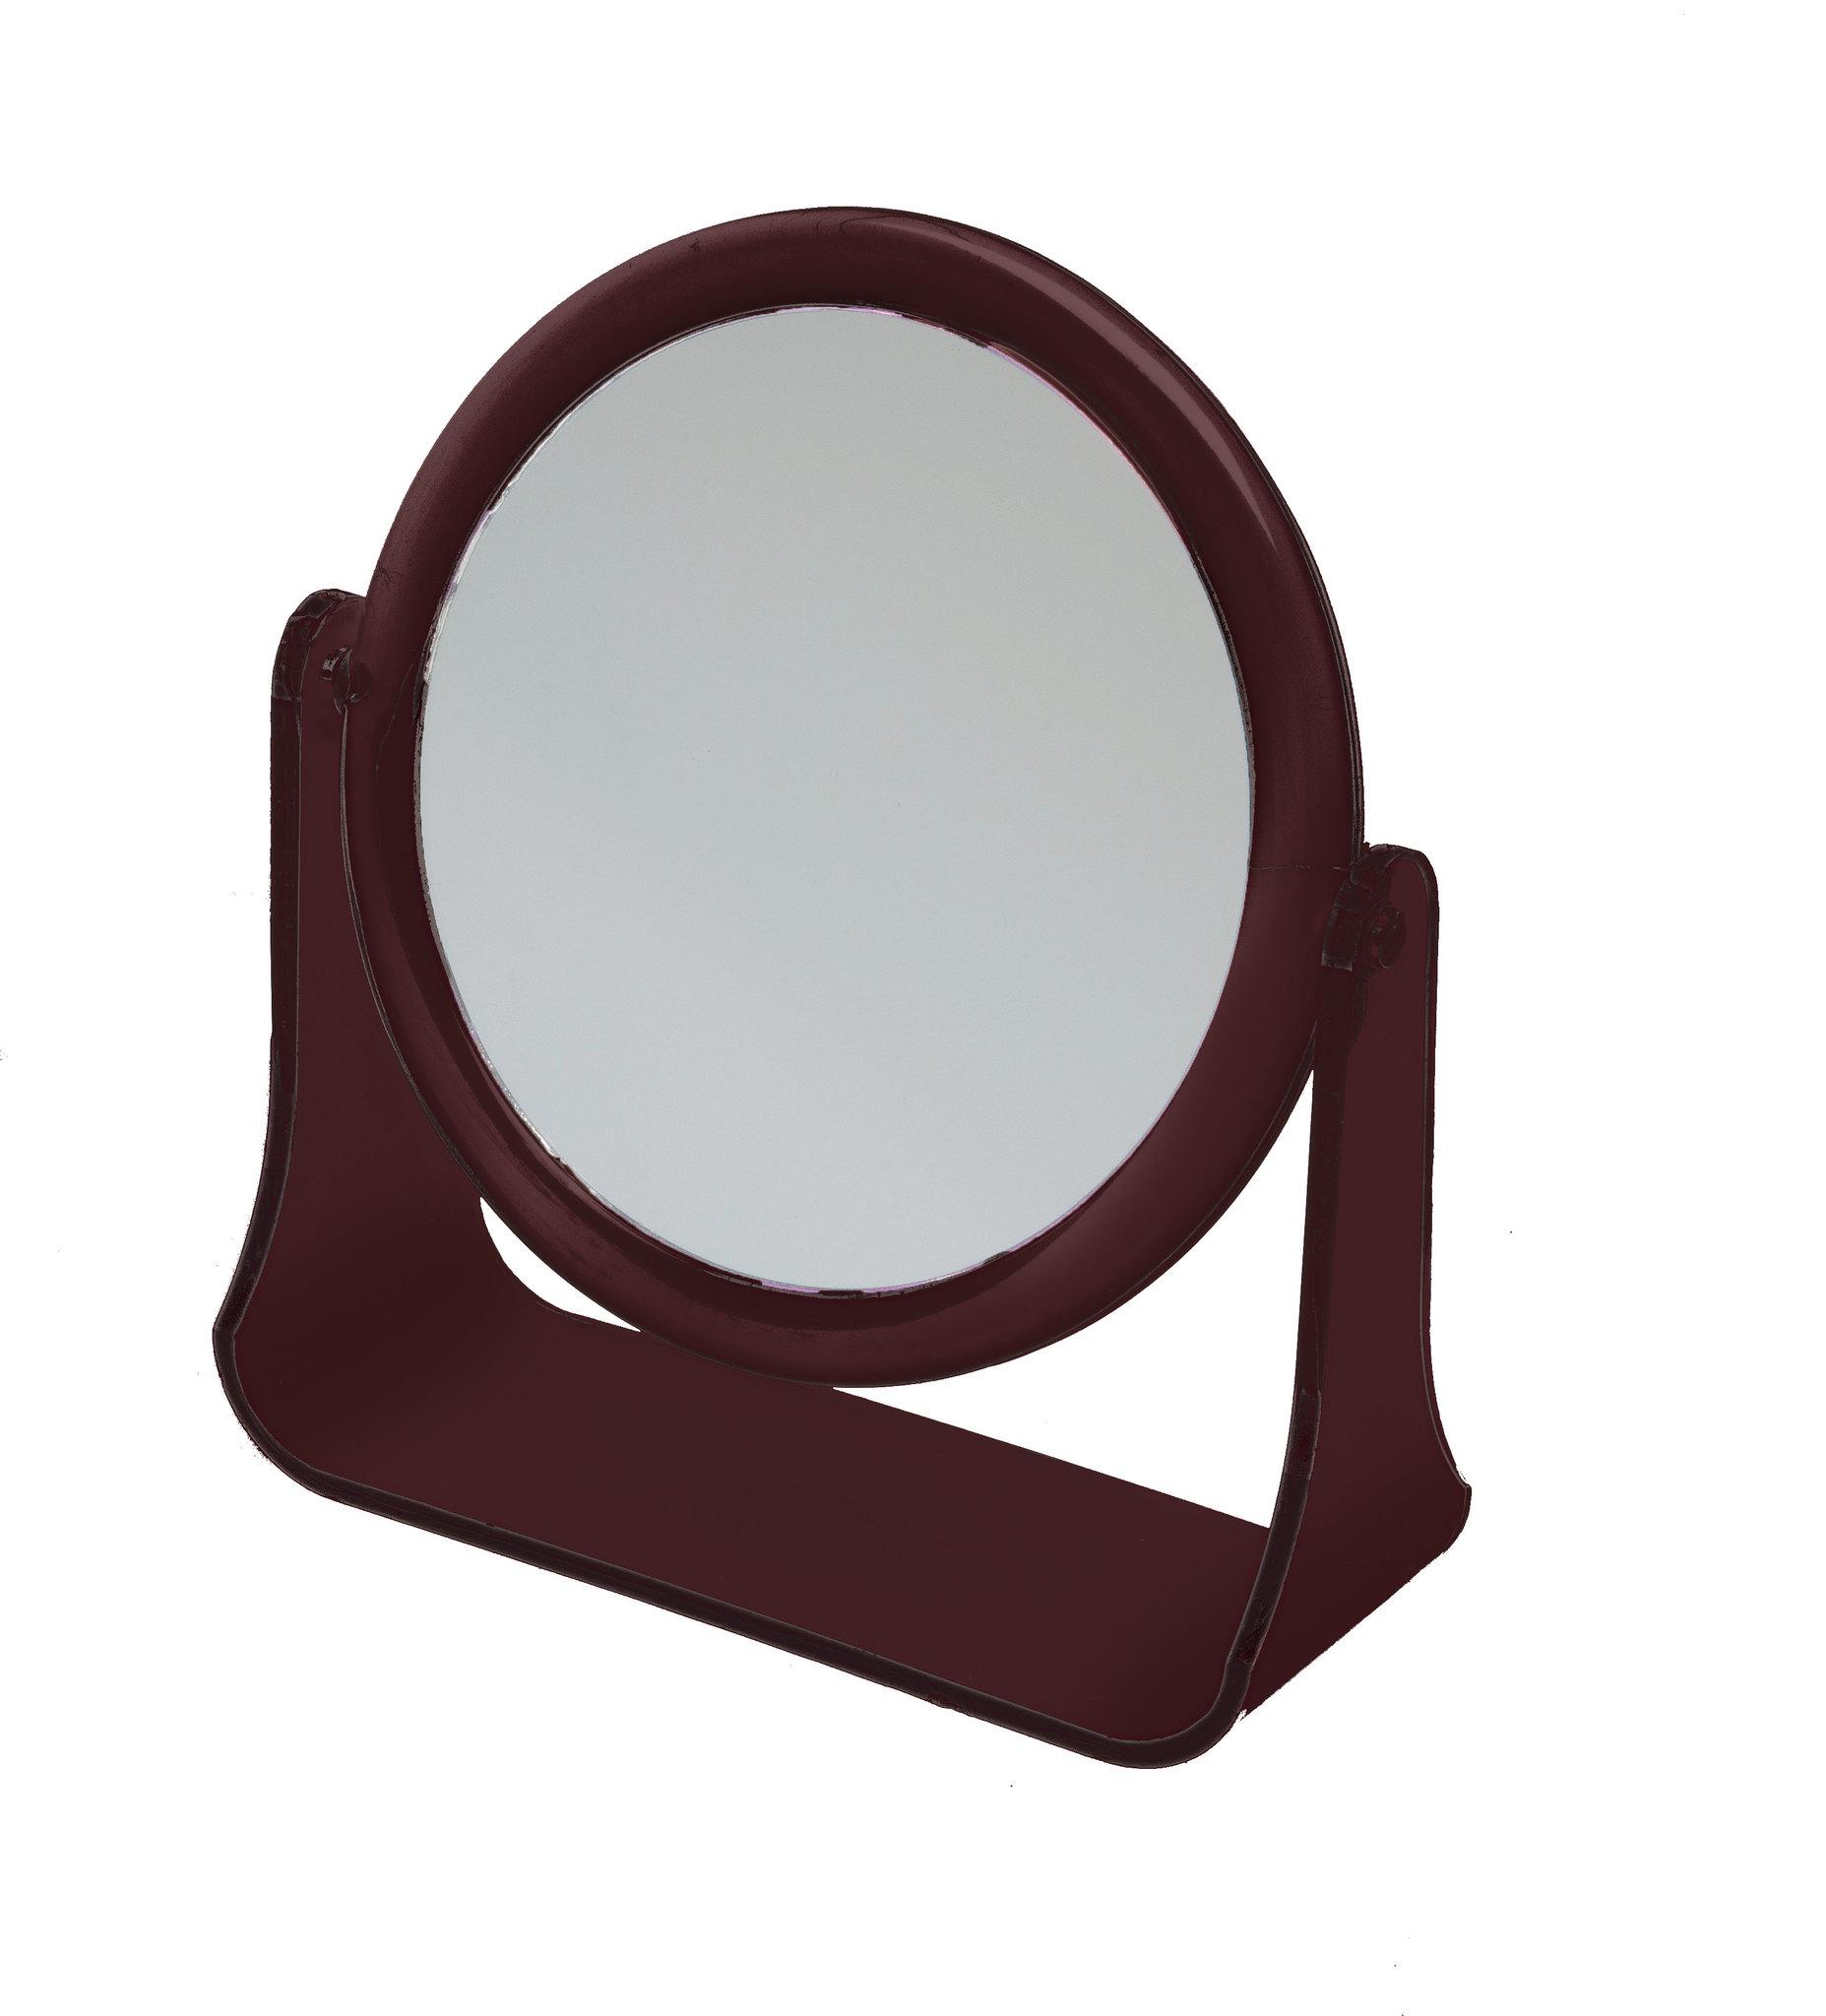 Зеркало Dewal Beauty настольное, в оправе янтарного цвета, на пластковой подставке, 178x160х10мм